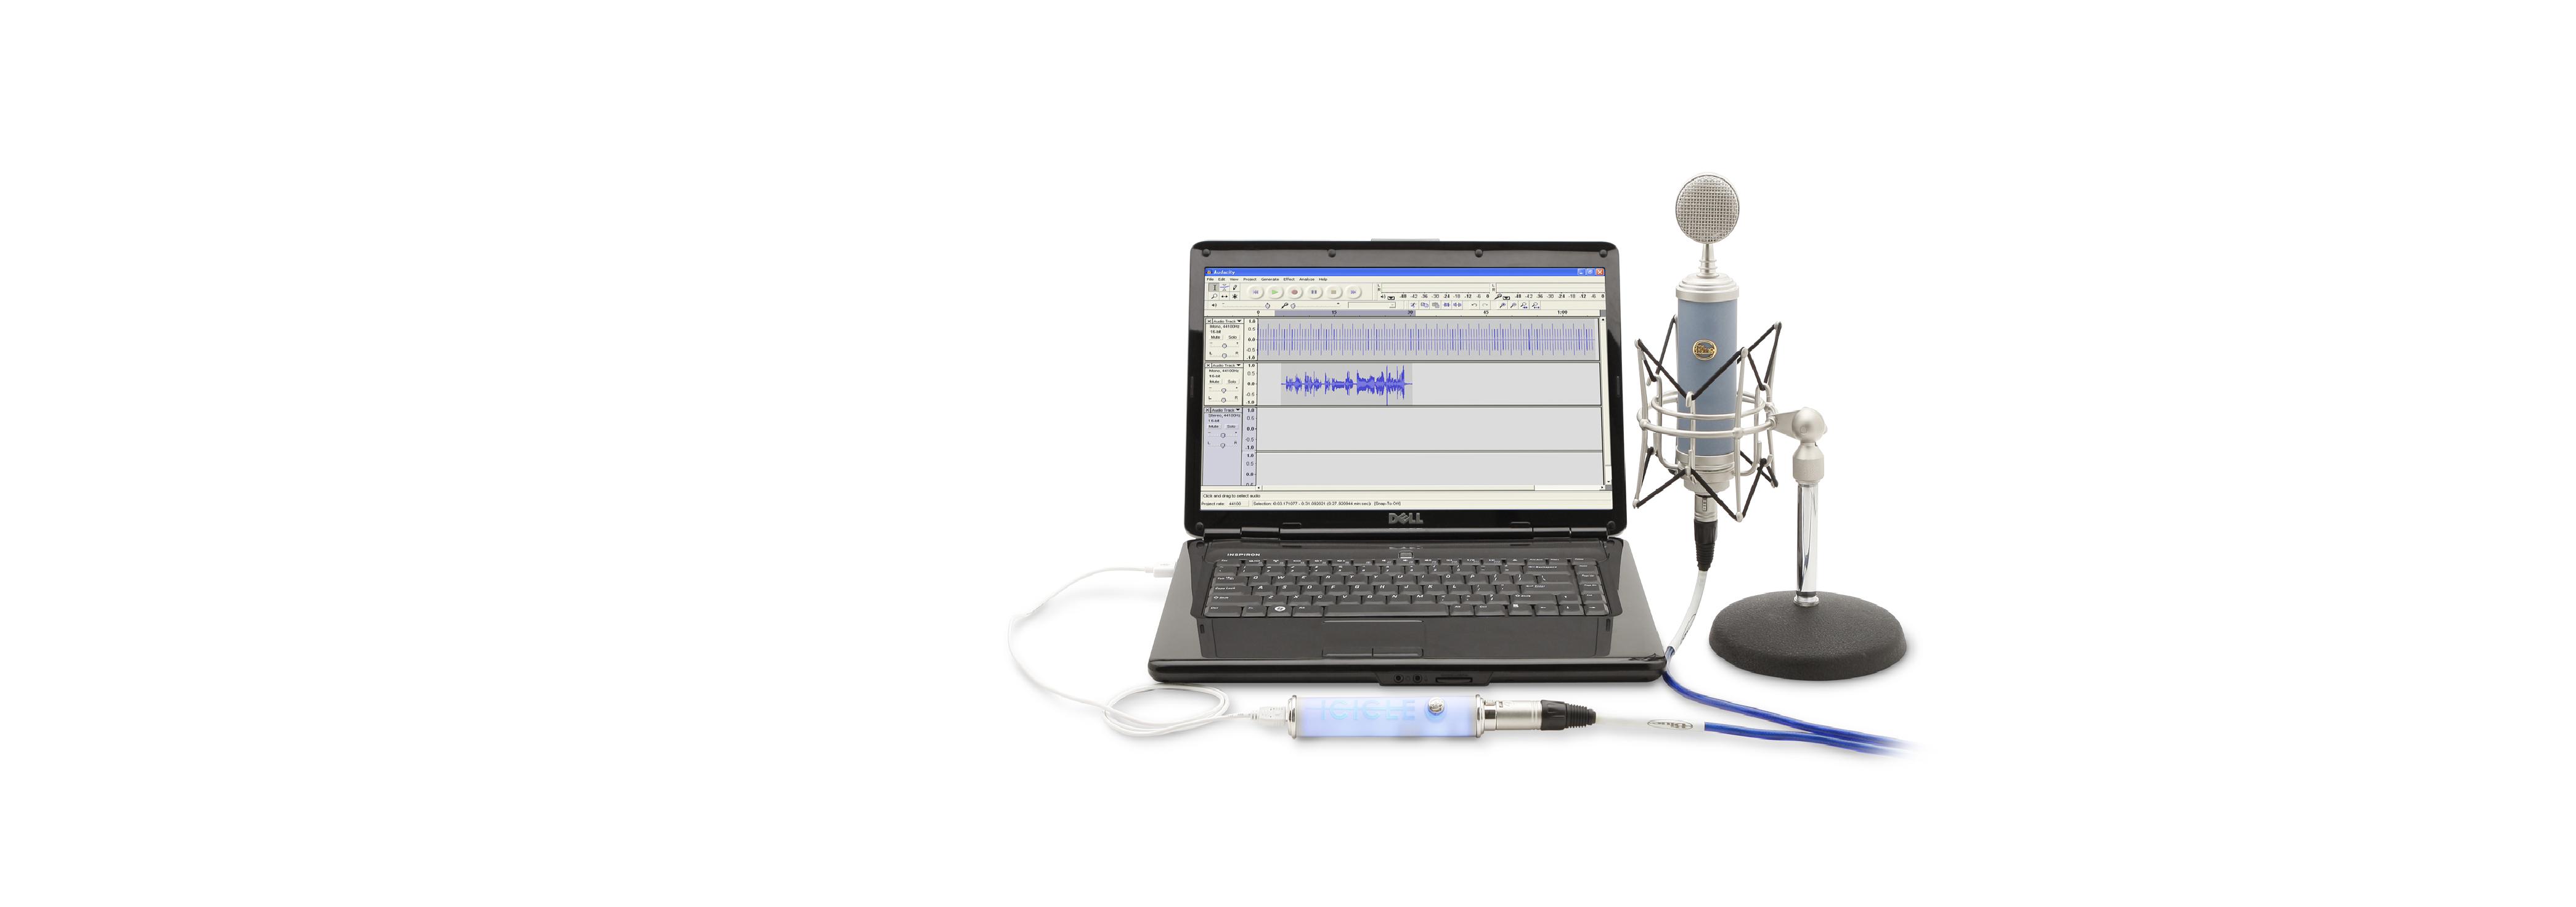 laptopmicrophoneblue.png